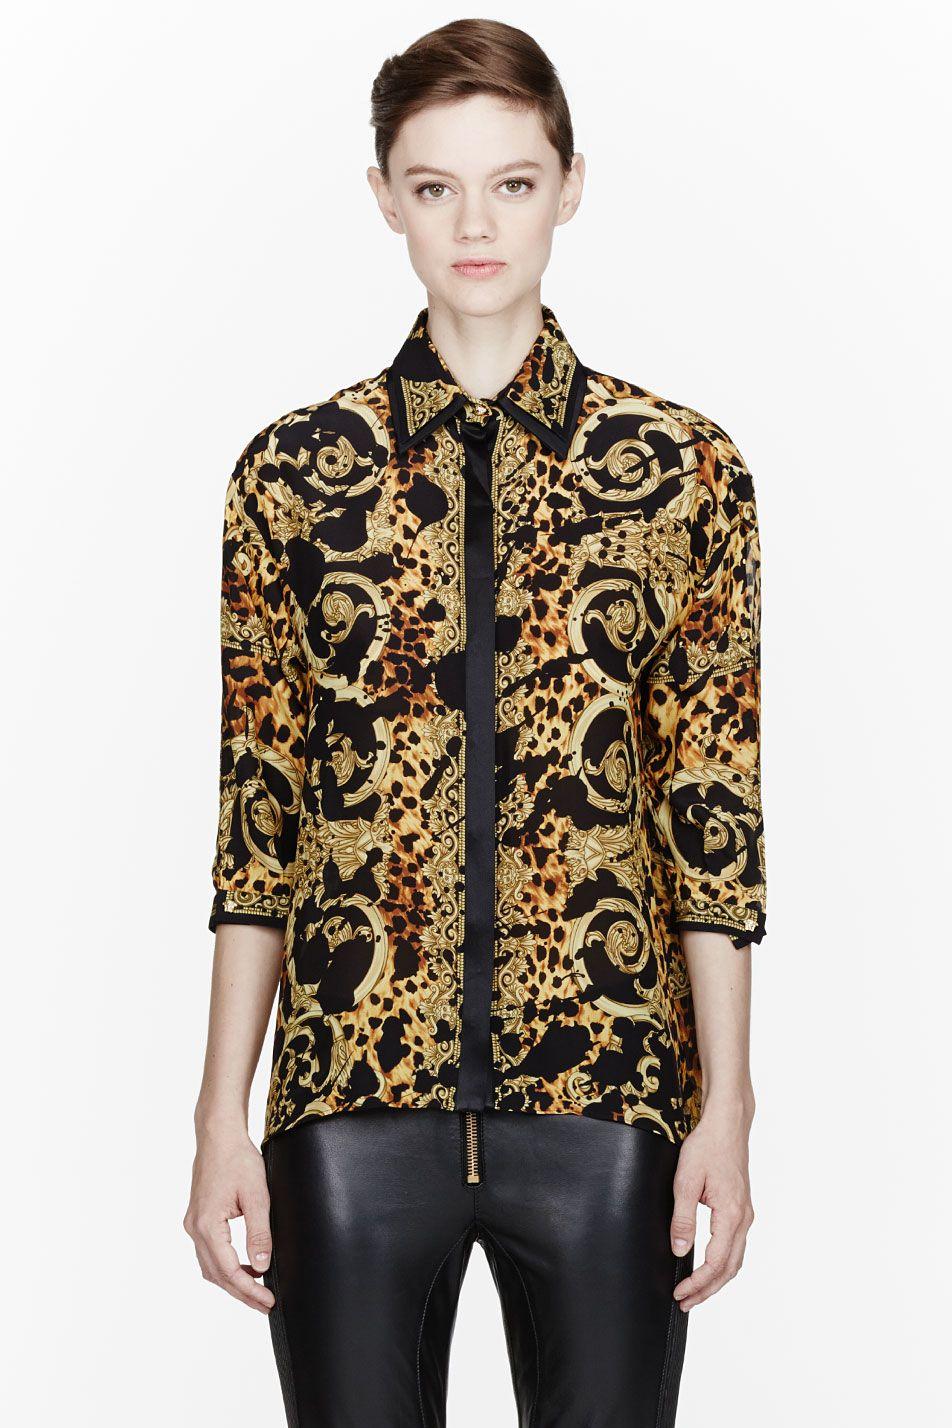 890aedd2991a9 Black And Gold Silk Shirts - DREAMWORKS